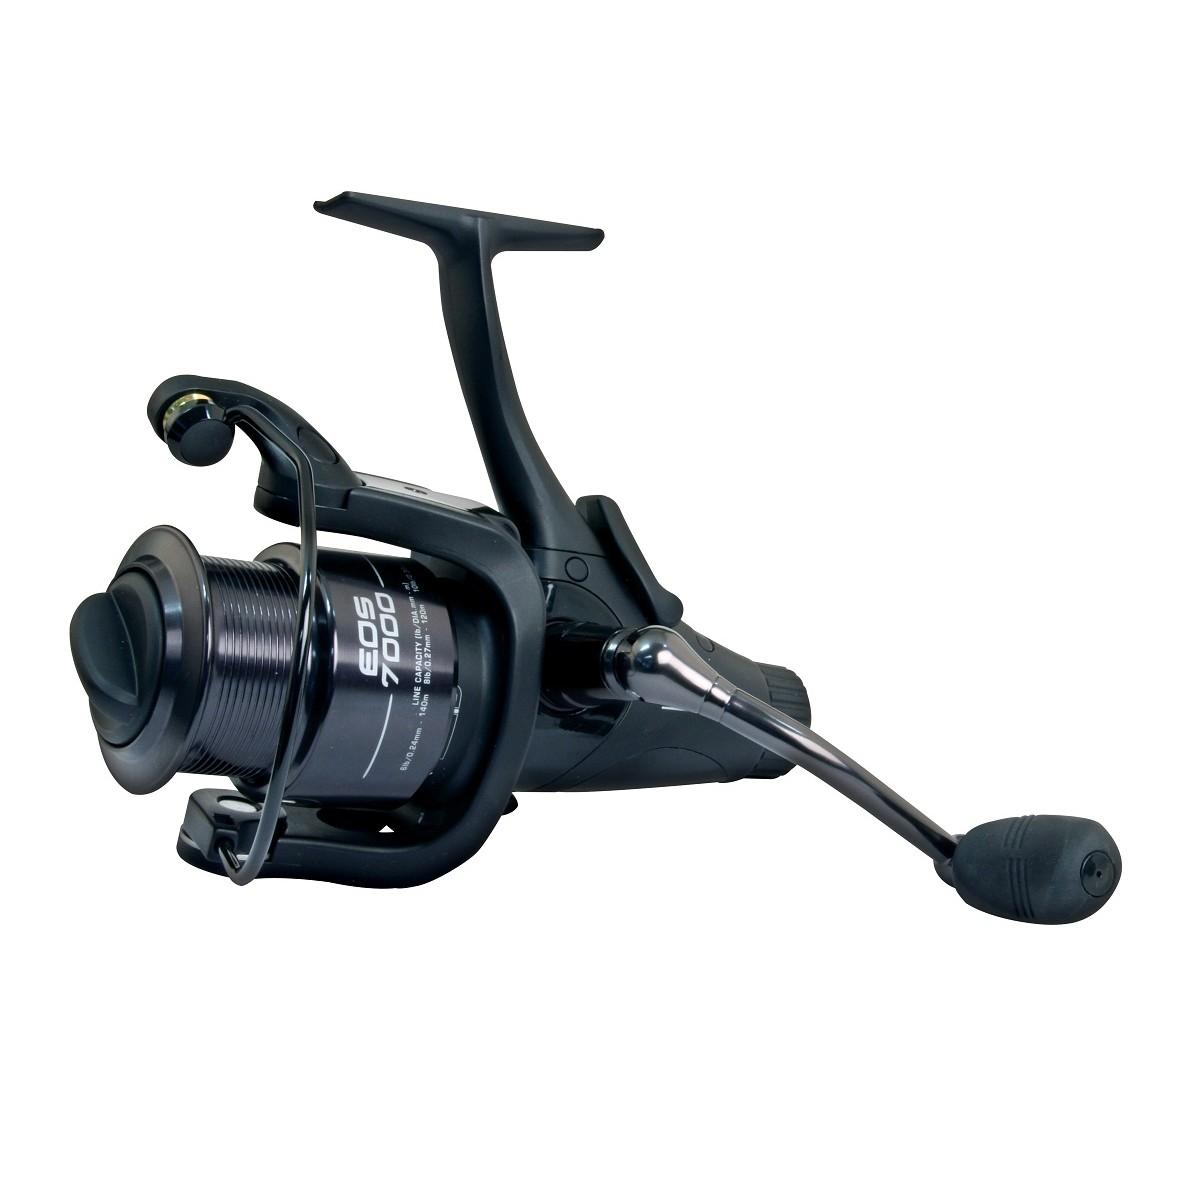 Риболовна макара FOX EOS 7000